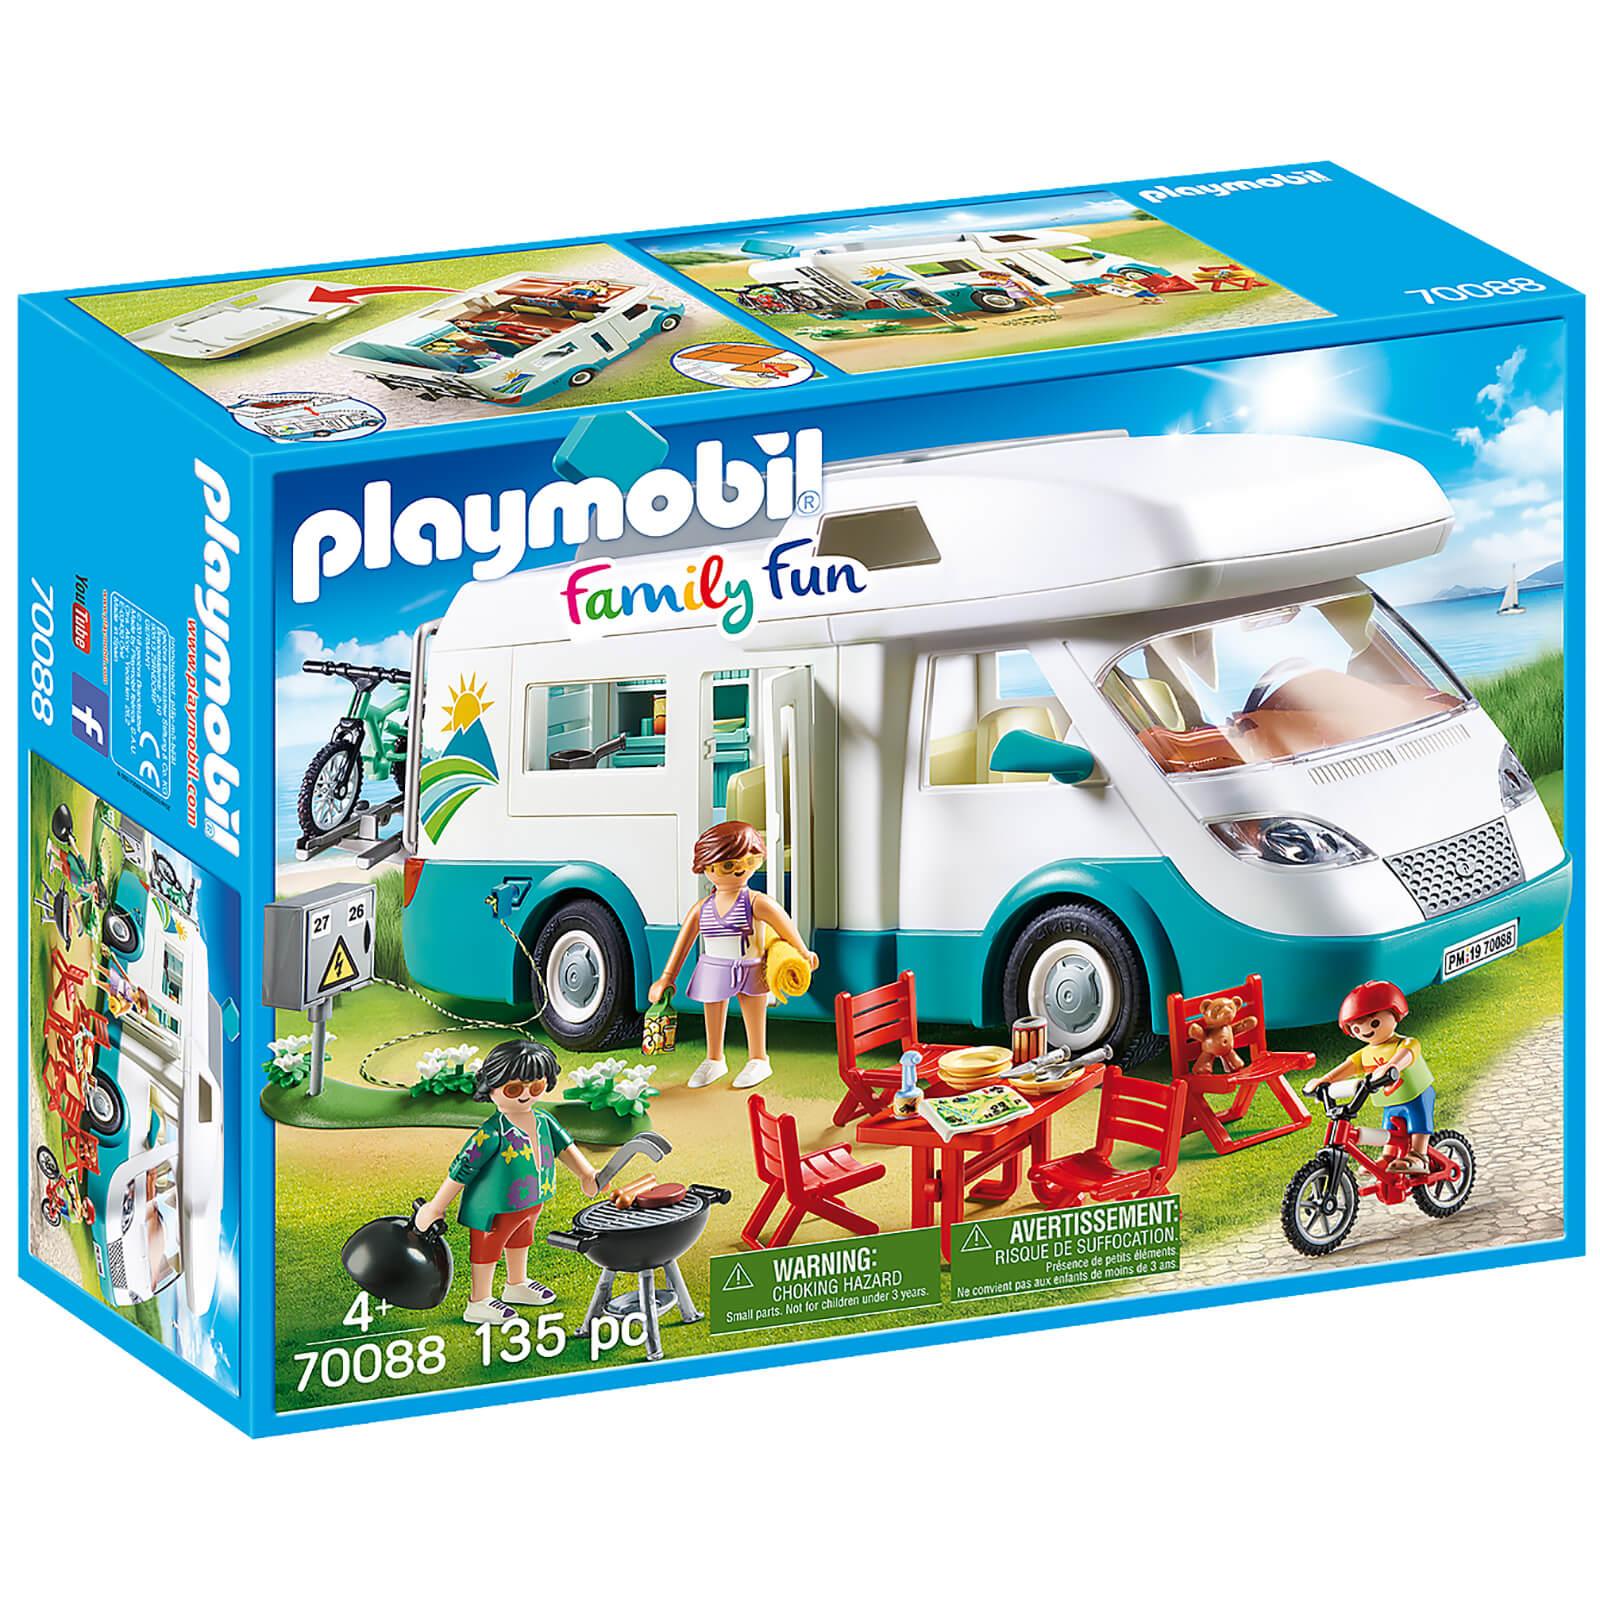 Image of Playmobil Family Fun Family Camper (70088)